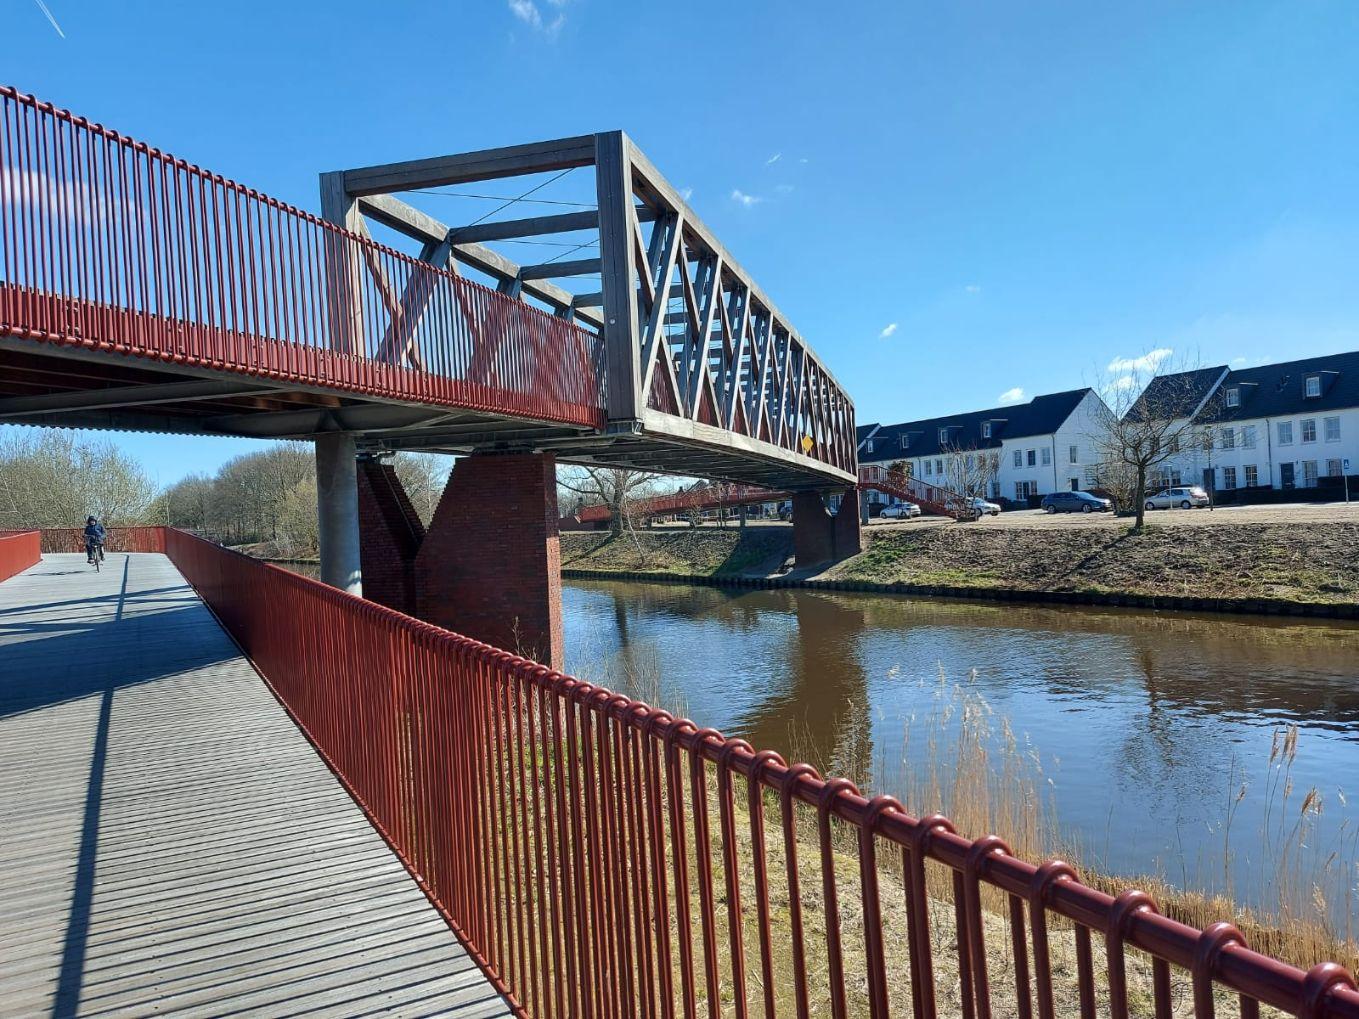 Stönner-Meijwaardbrug, Oirschot